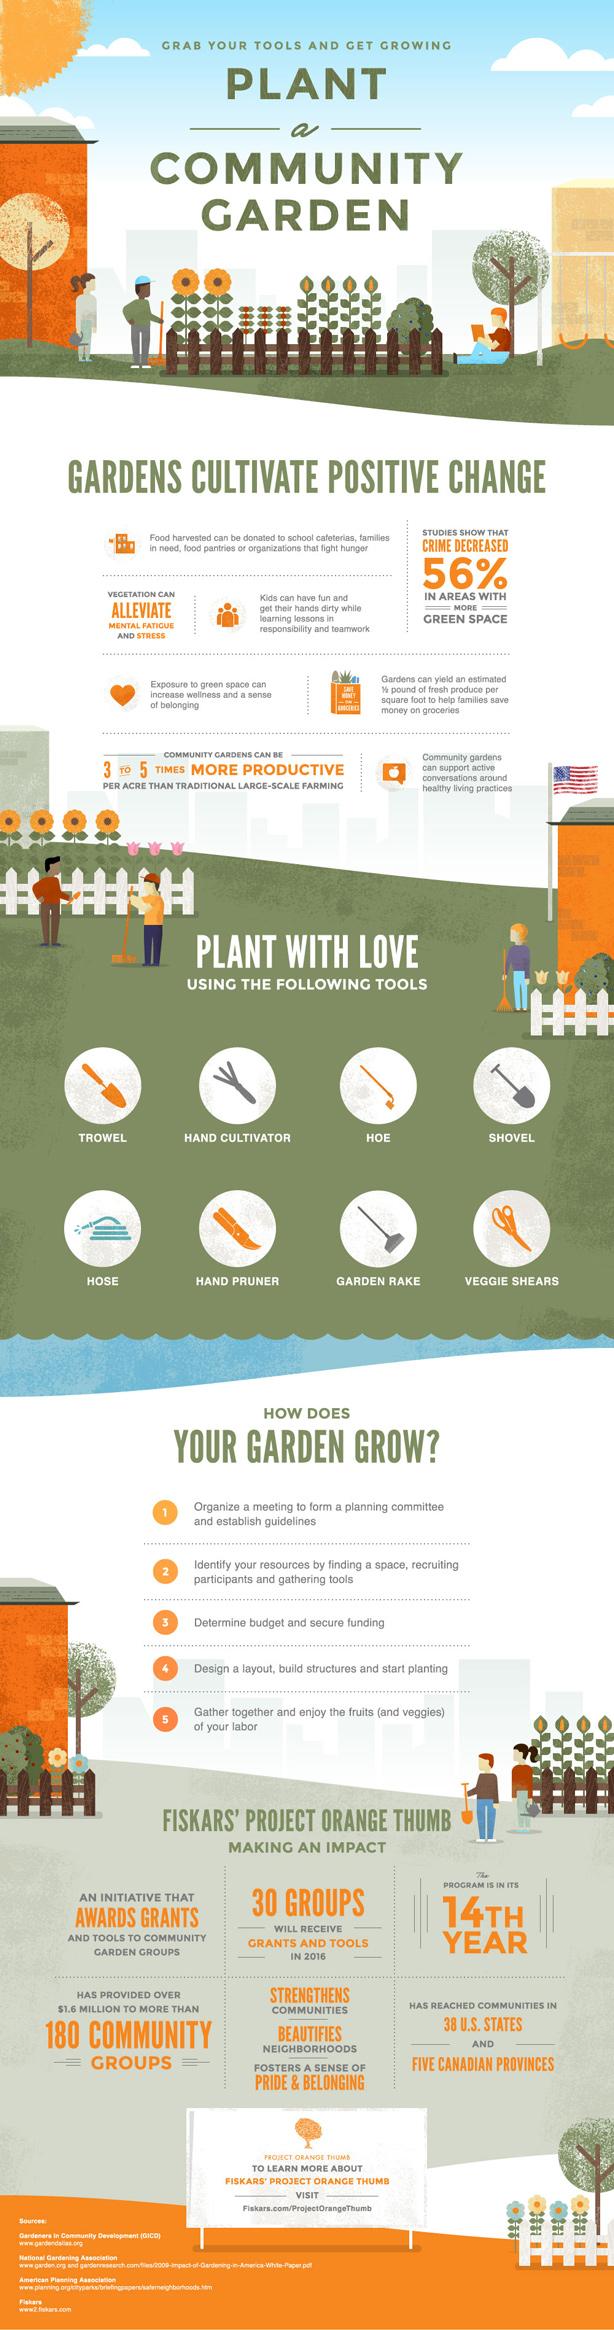 Project Orange Thumb Community Garden Grant Recipients